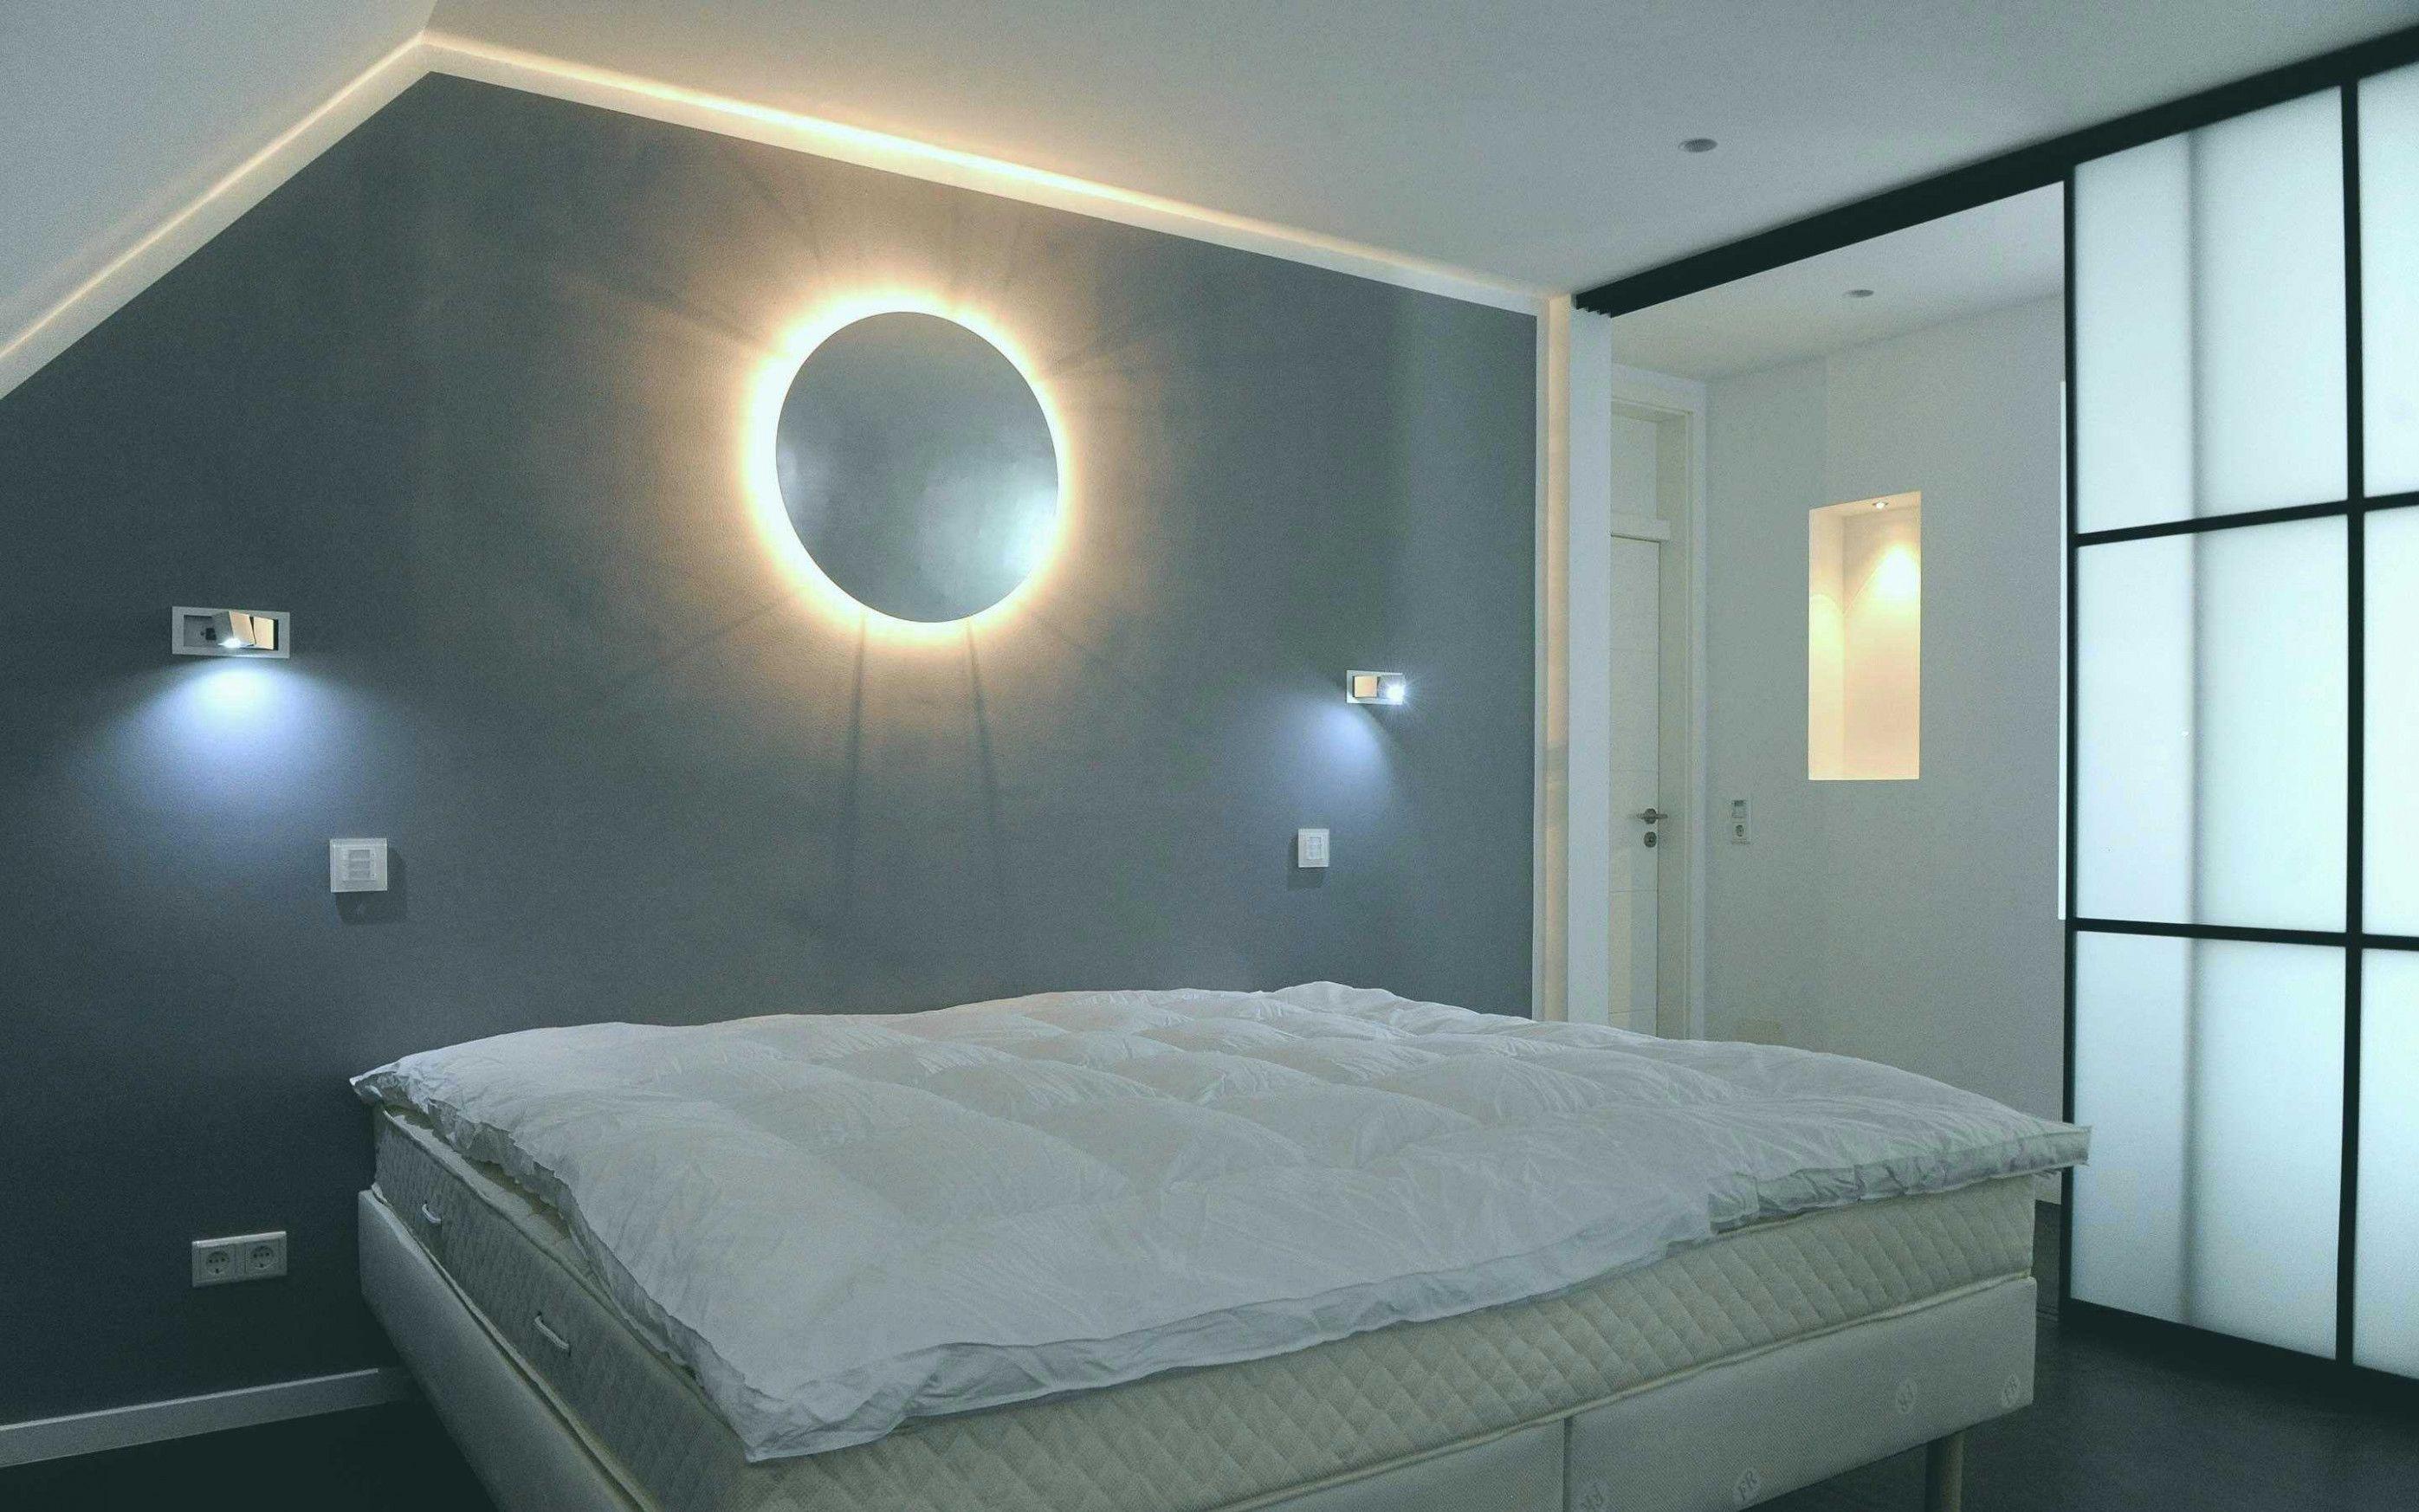 schlafzimmer lampe modern  youwillneverknoweverything